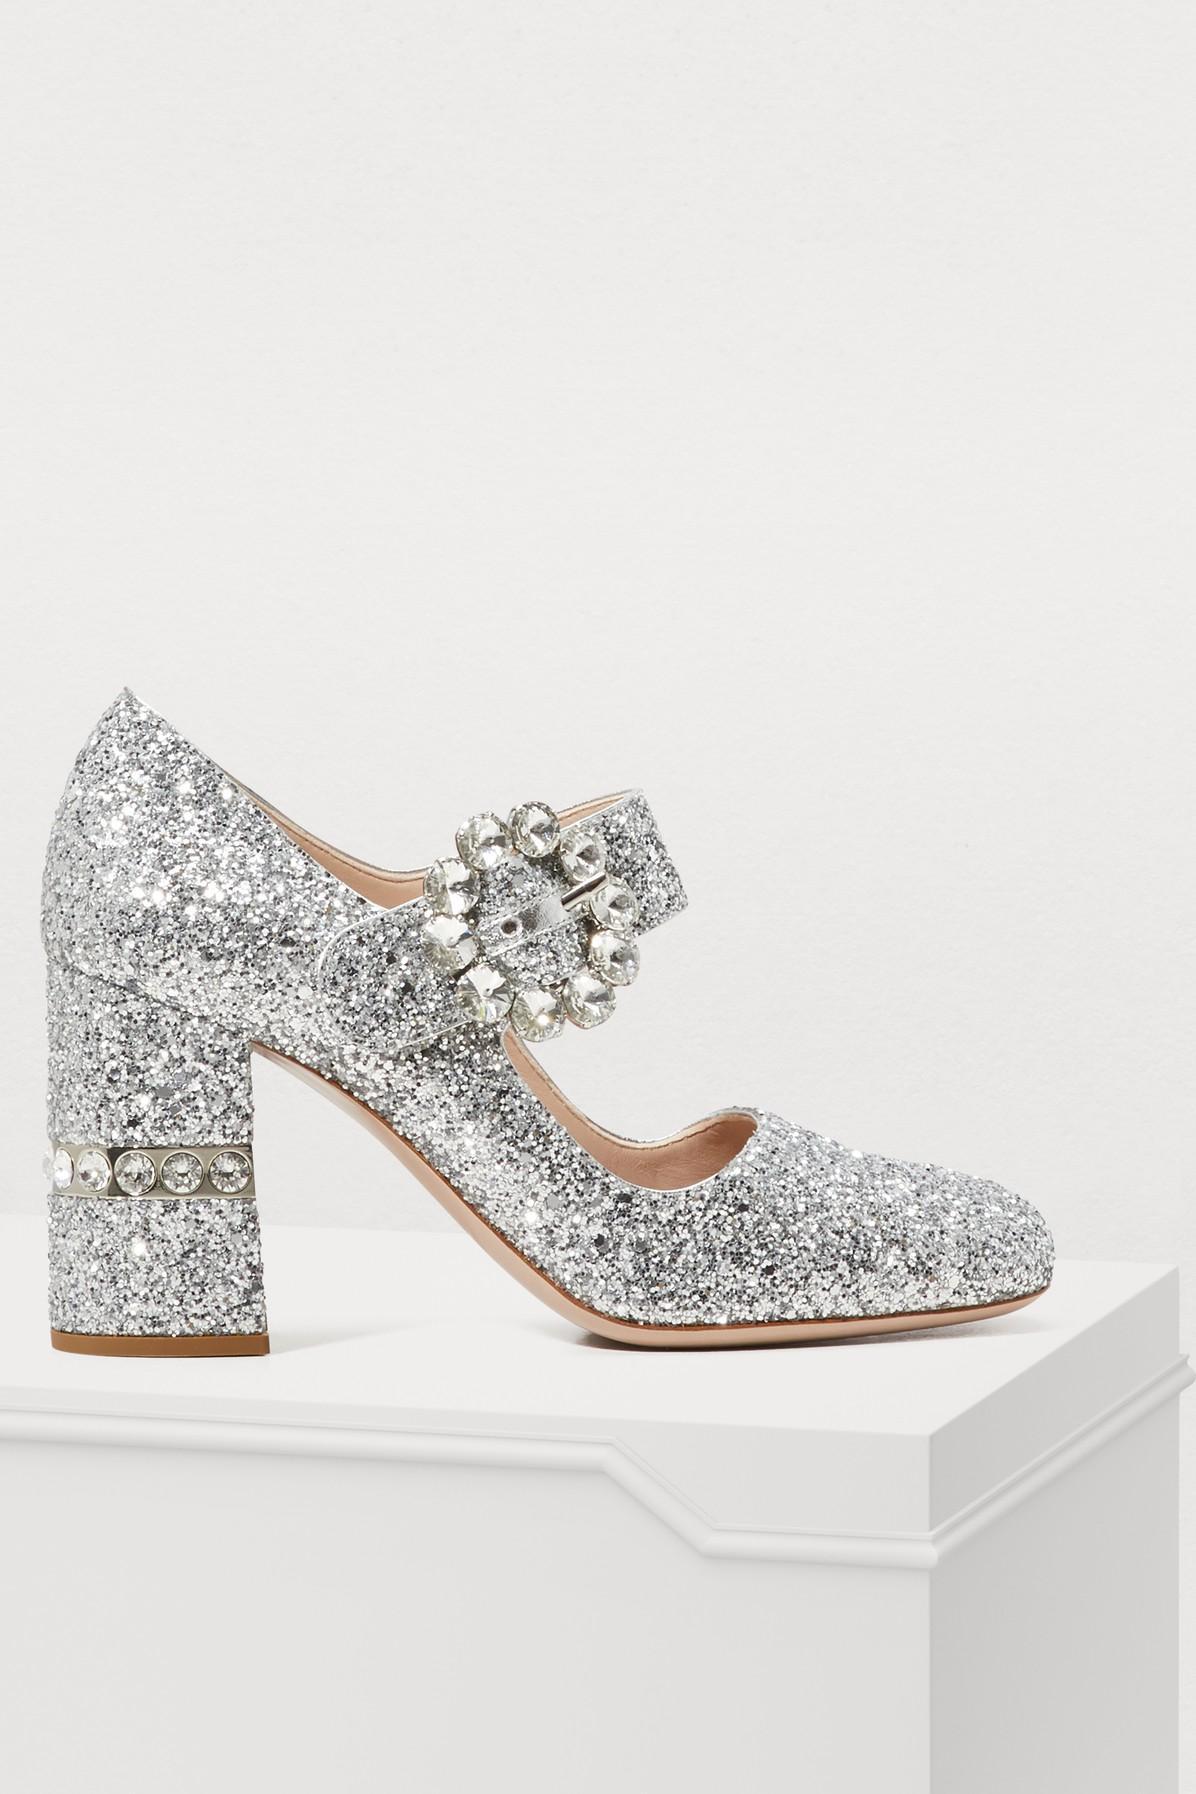 eaa98e5541f Miu Miu Glitter Mary Jane Pumps In Silver In Metallic